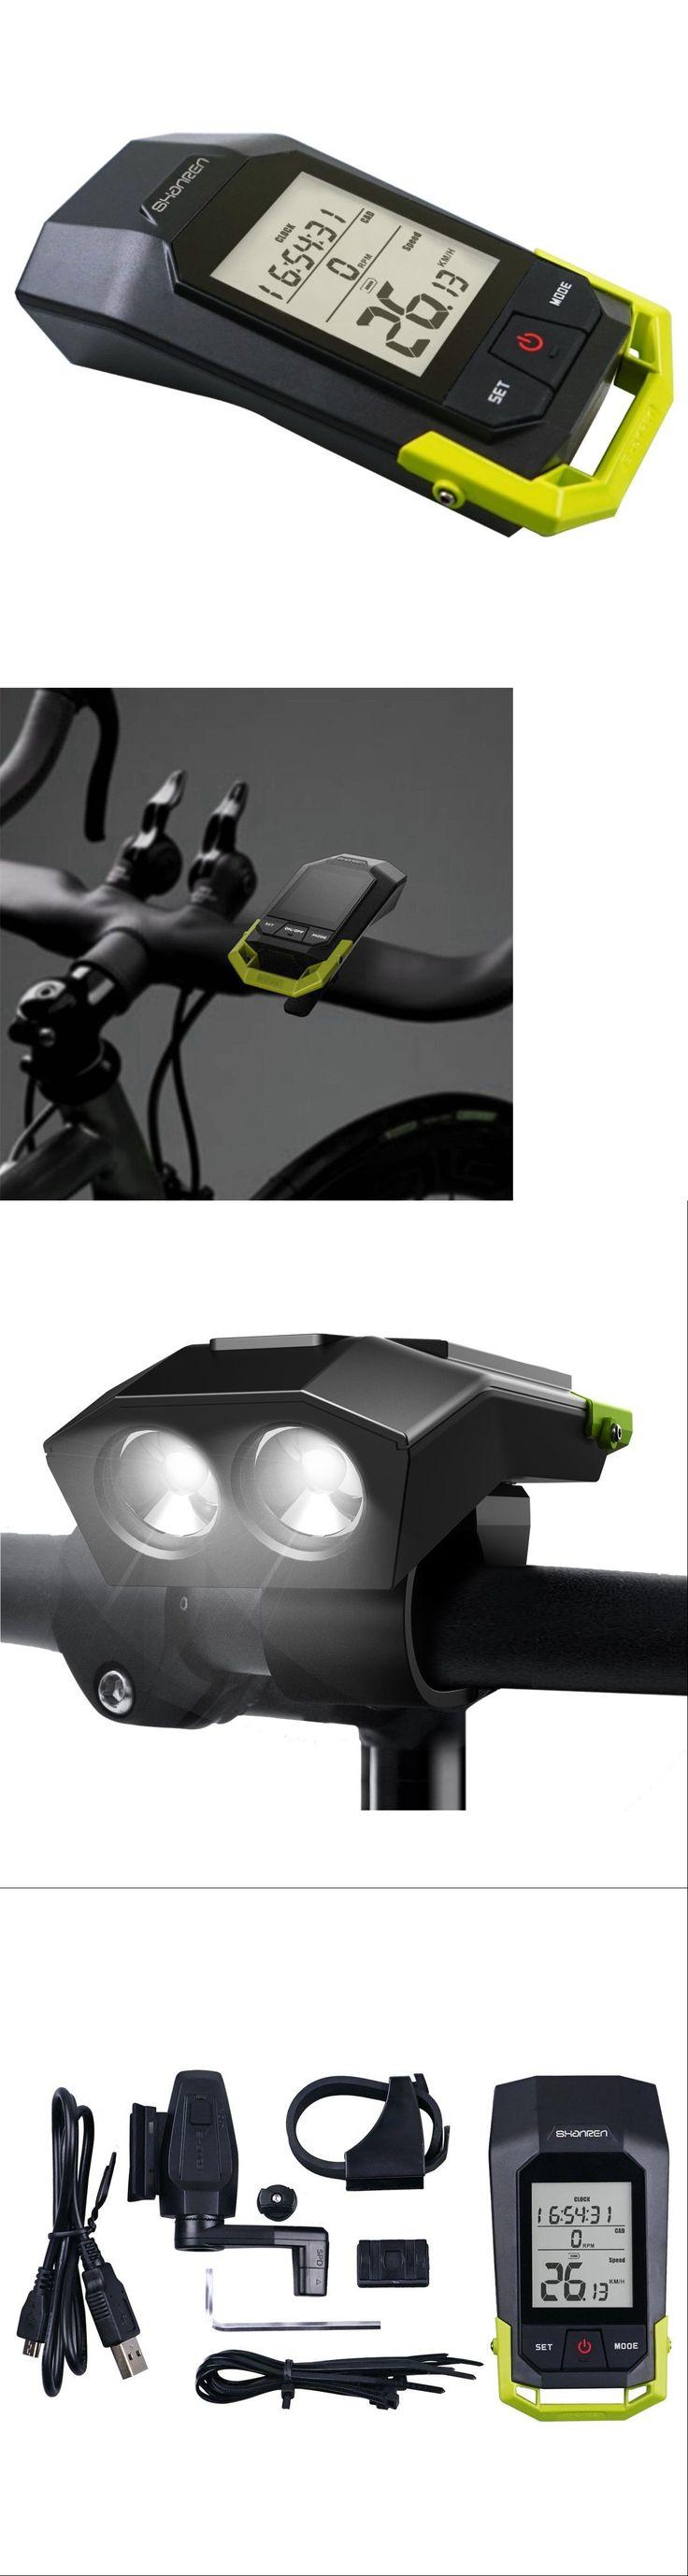 Cycle Computers and GPS 30108: Shanren Raptor Ii Bike Computer, Cadence Sensor Speedometer Odometer, Night Lite -> BUY IT NOW ONLY: $47.5 on eBay!